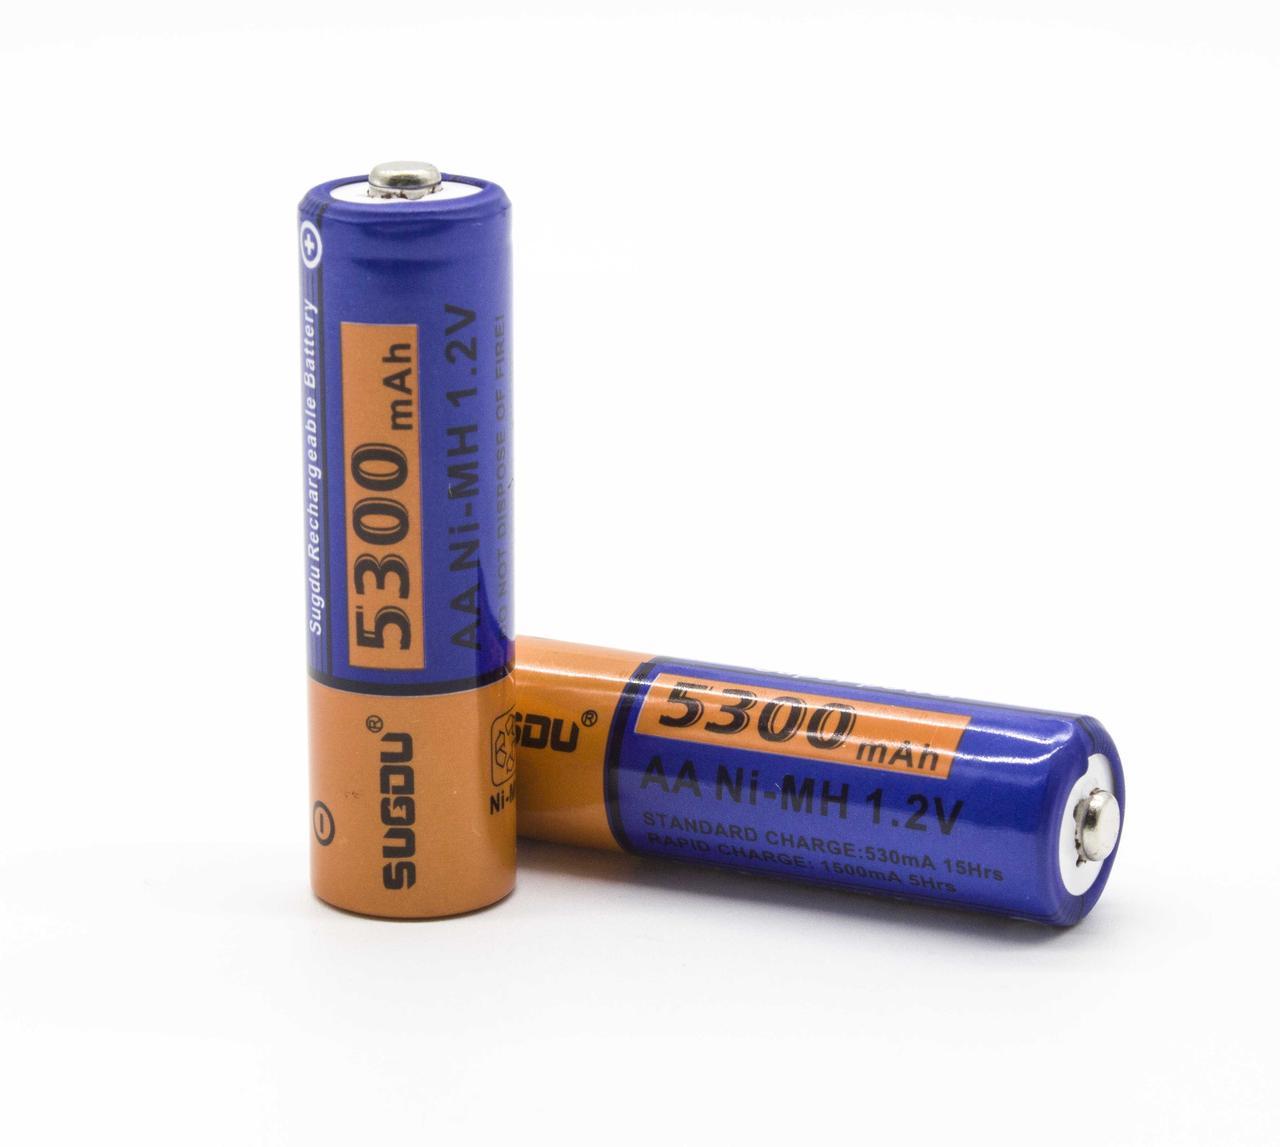 Пальчиковая аккумуляторная батарейка в блистере Sugdu 5300SD AA (комплект 2шт.)